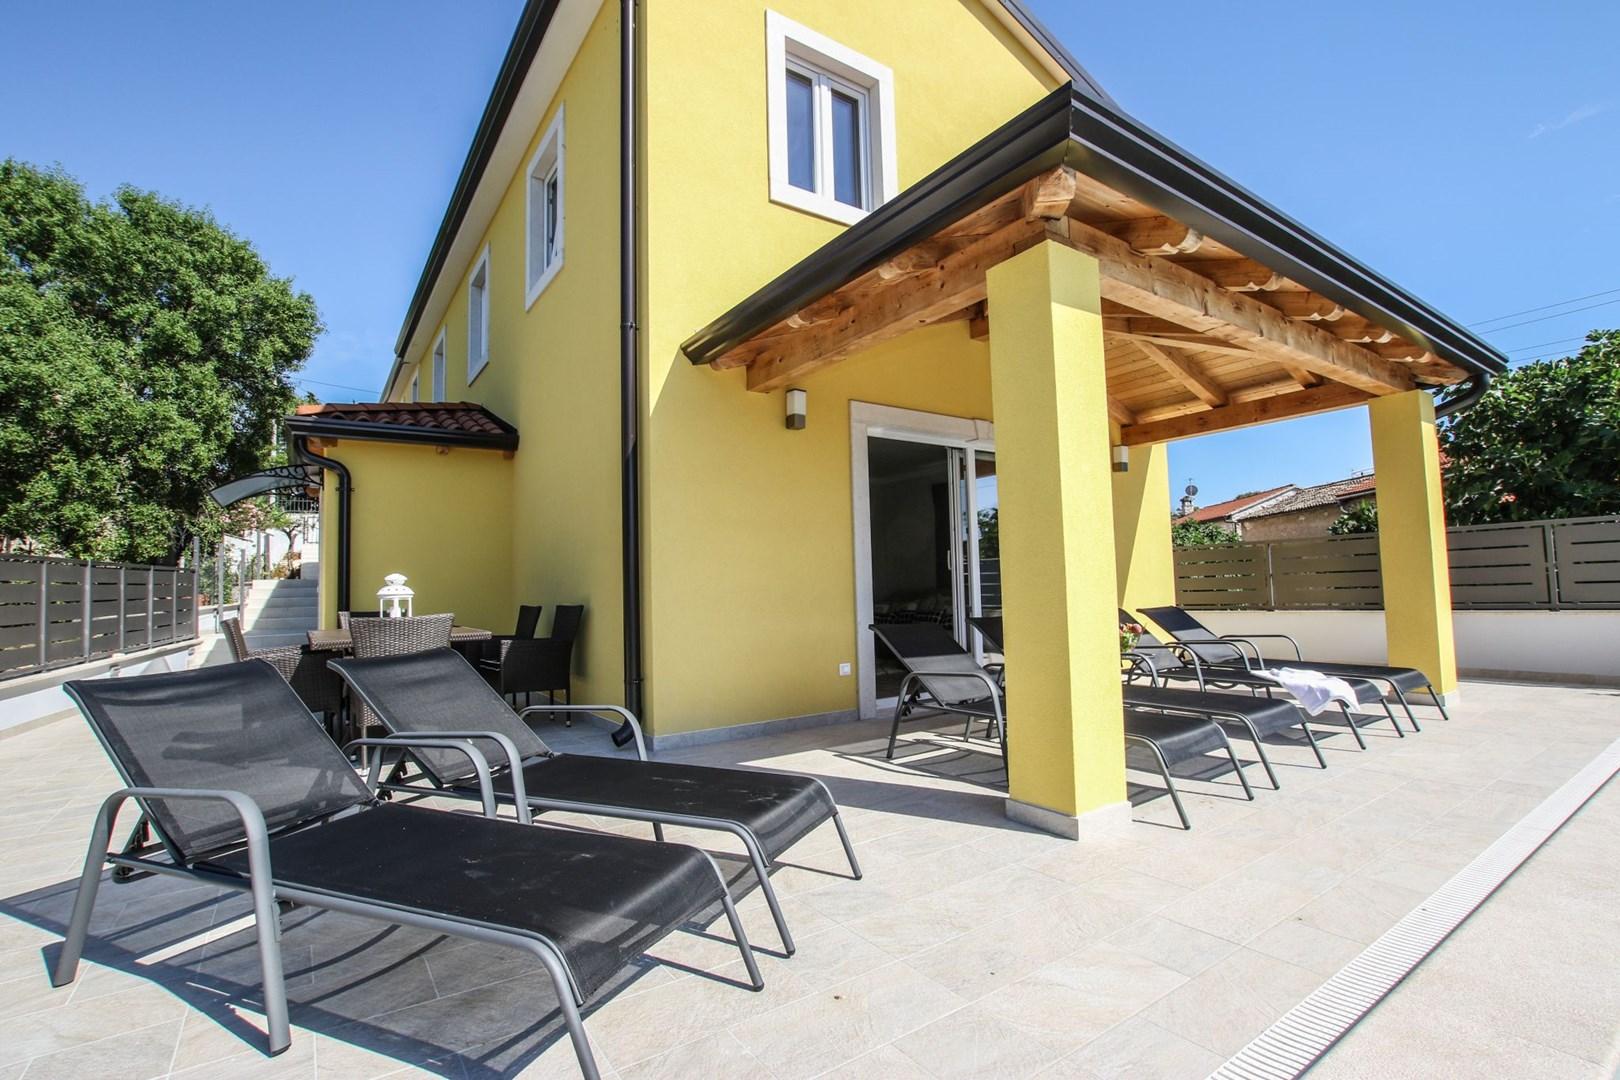 Ferienhaus Villa Cecilia mit privatem Pool in der Nähe von Aquacolors (2240240), Mugeba, , Istrien, Kroatien, Bild 3